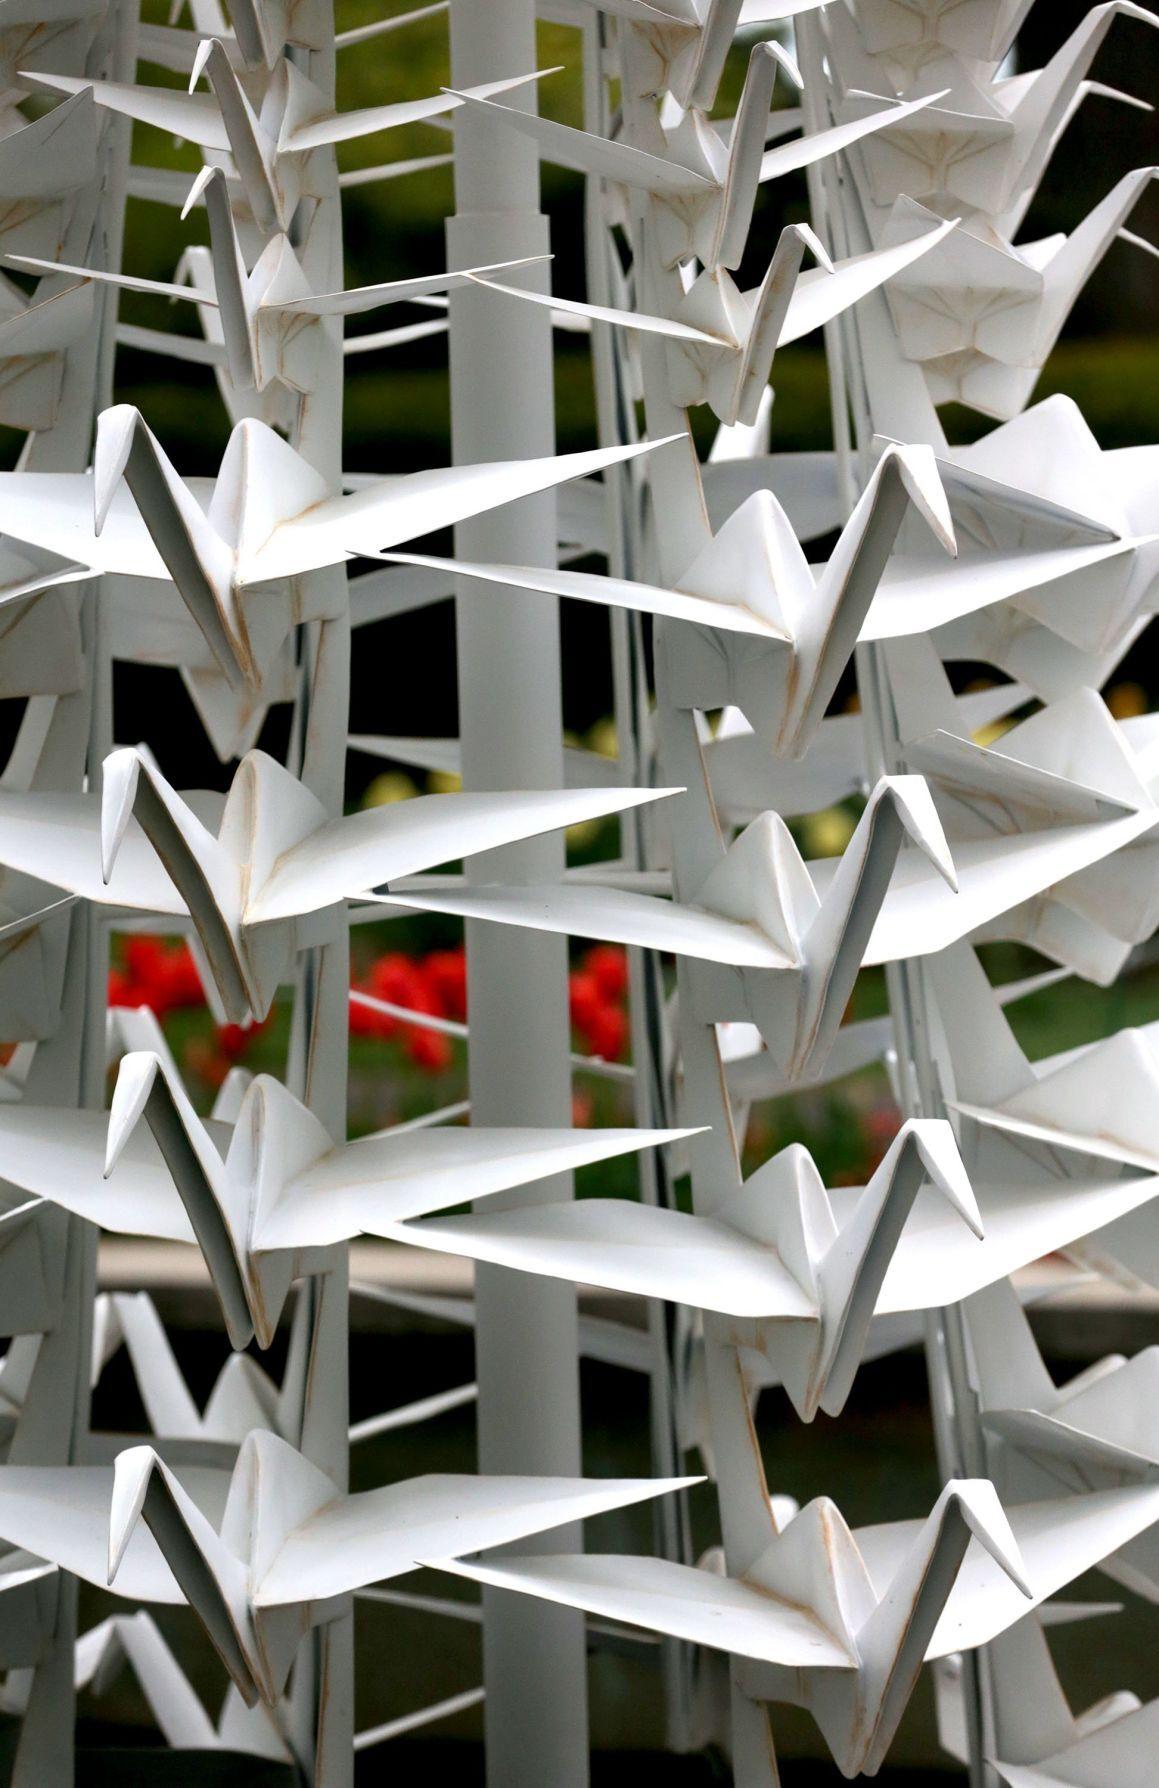 Scenes from Origami in the Garden